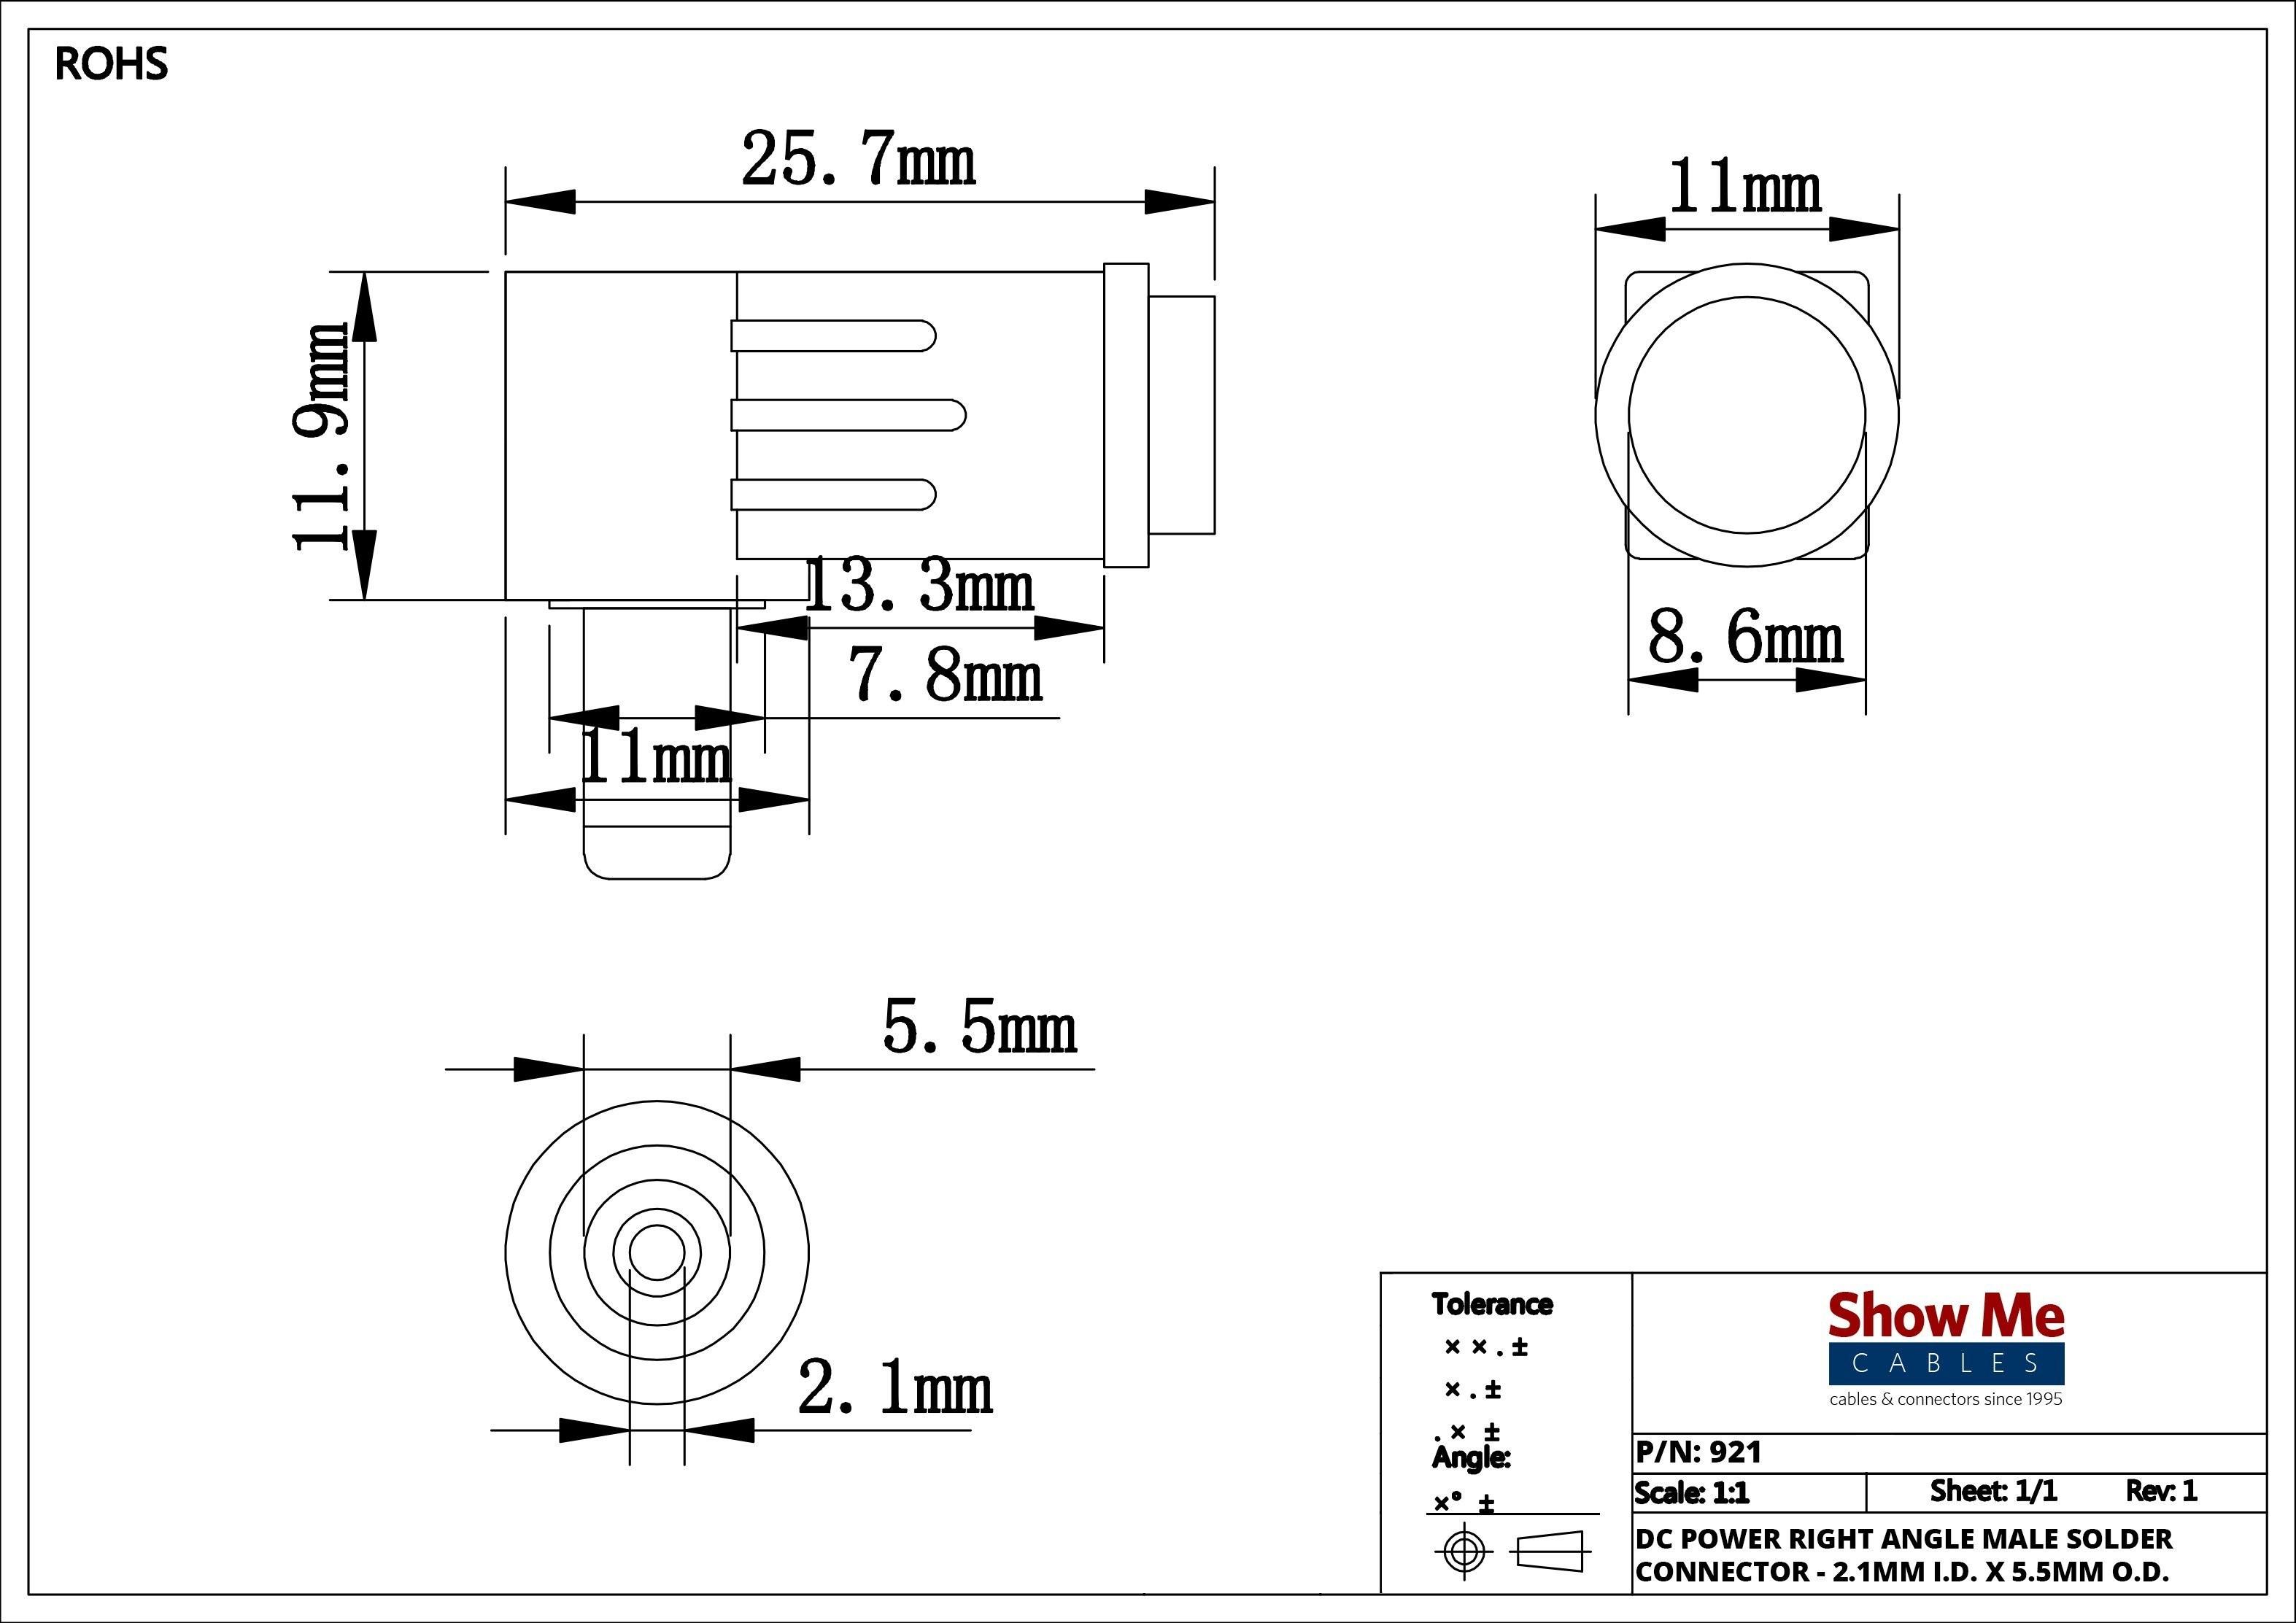 Diagram David Clark Mic Wiring Diagram Full Version Hd Quality Wiring Diagram Automedixaas Lacleduparticulier Immo Fr